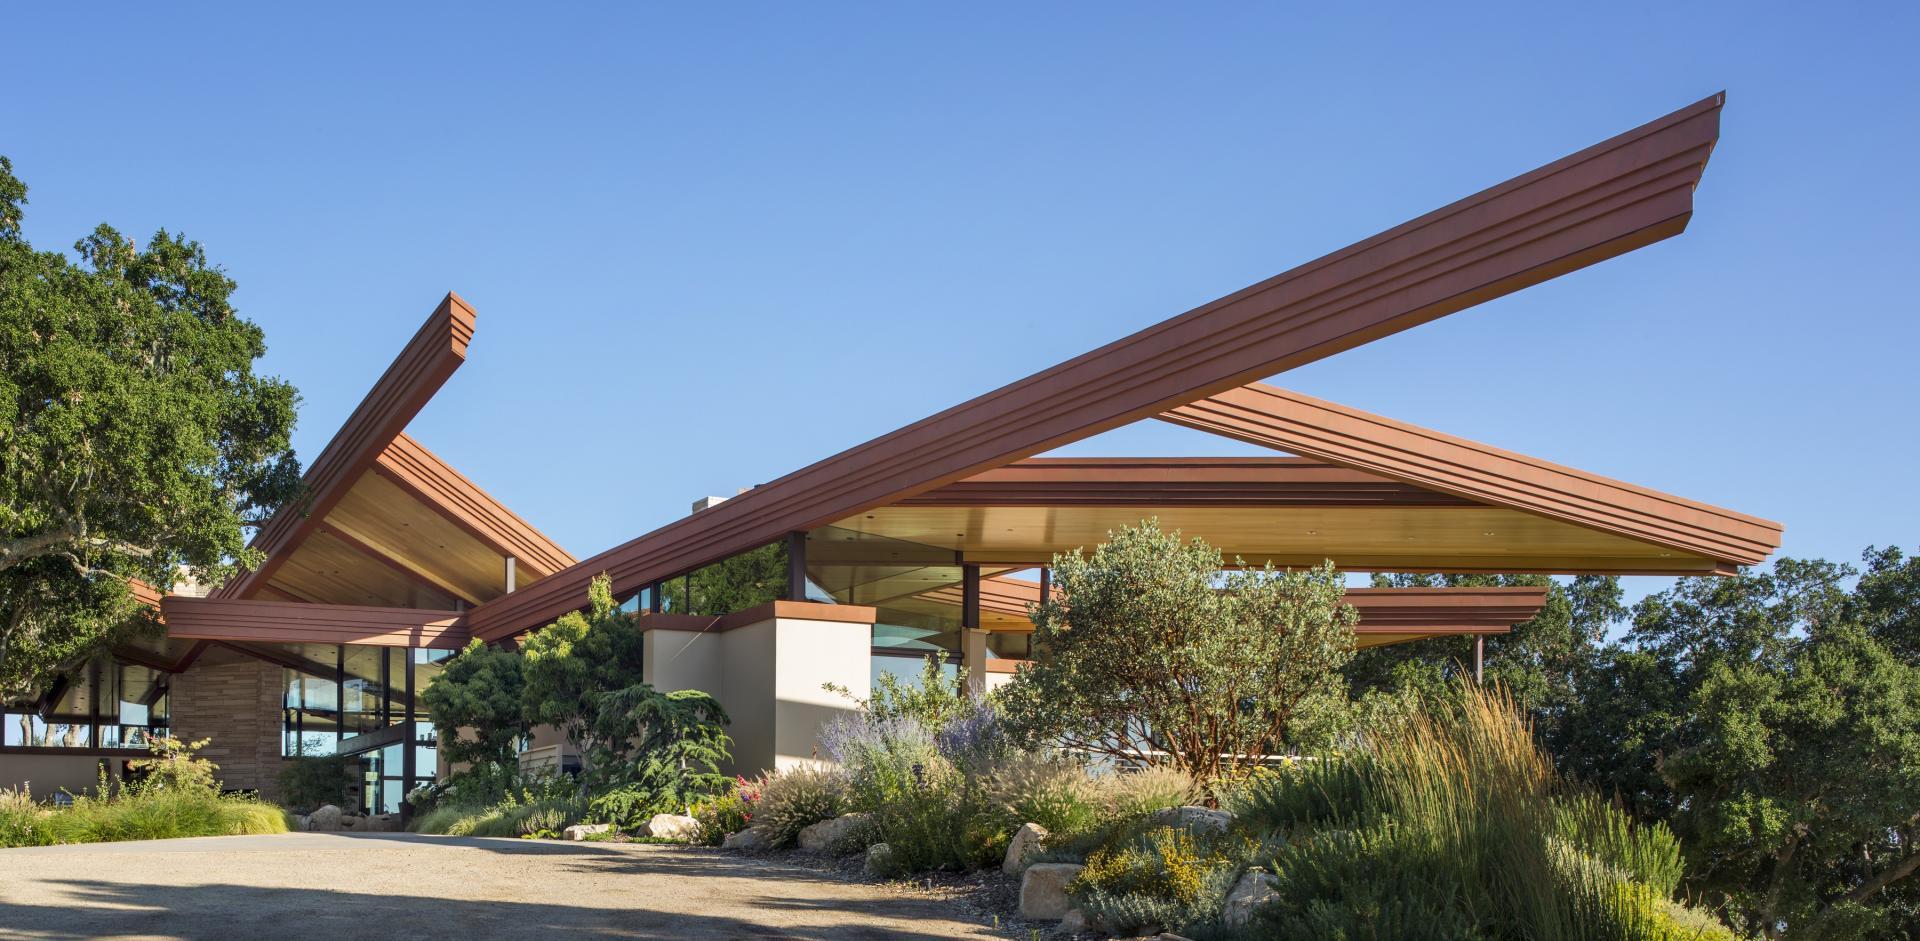 Unique roof